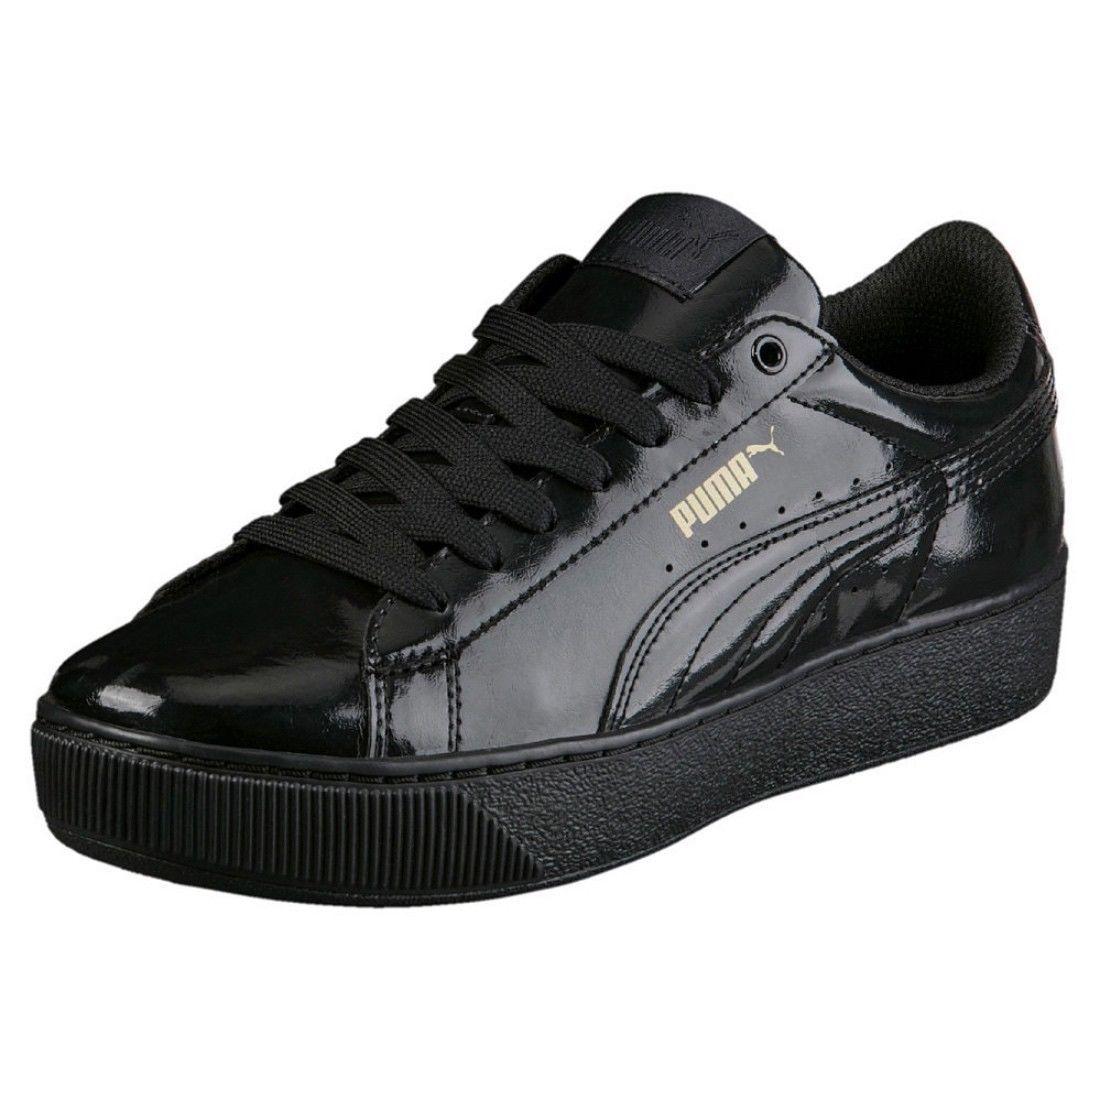 Puma Vikky Platform Patent Women's Sneakers Shoes Black